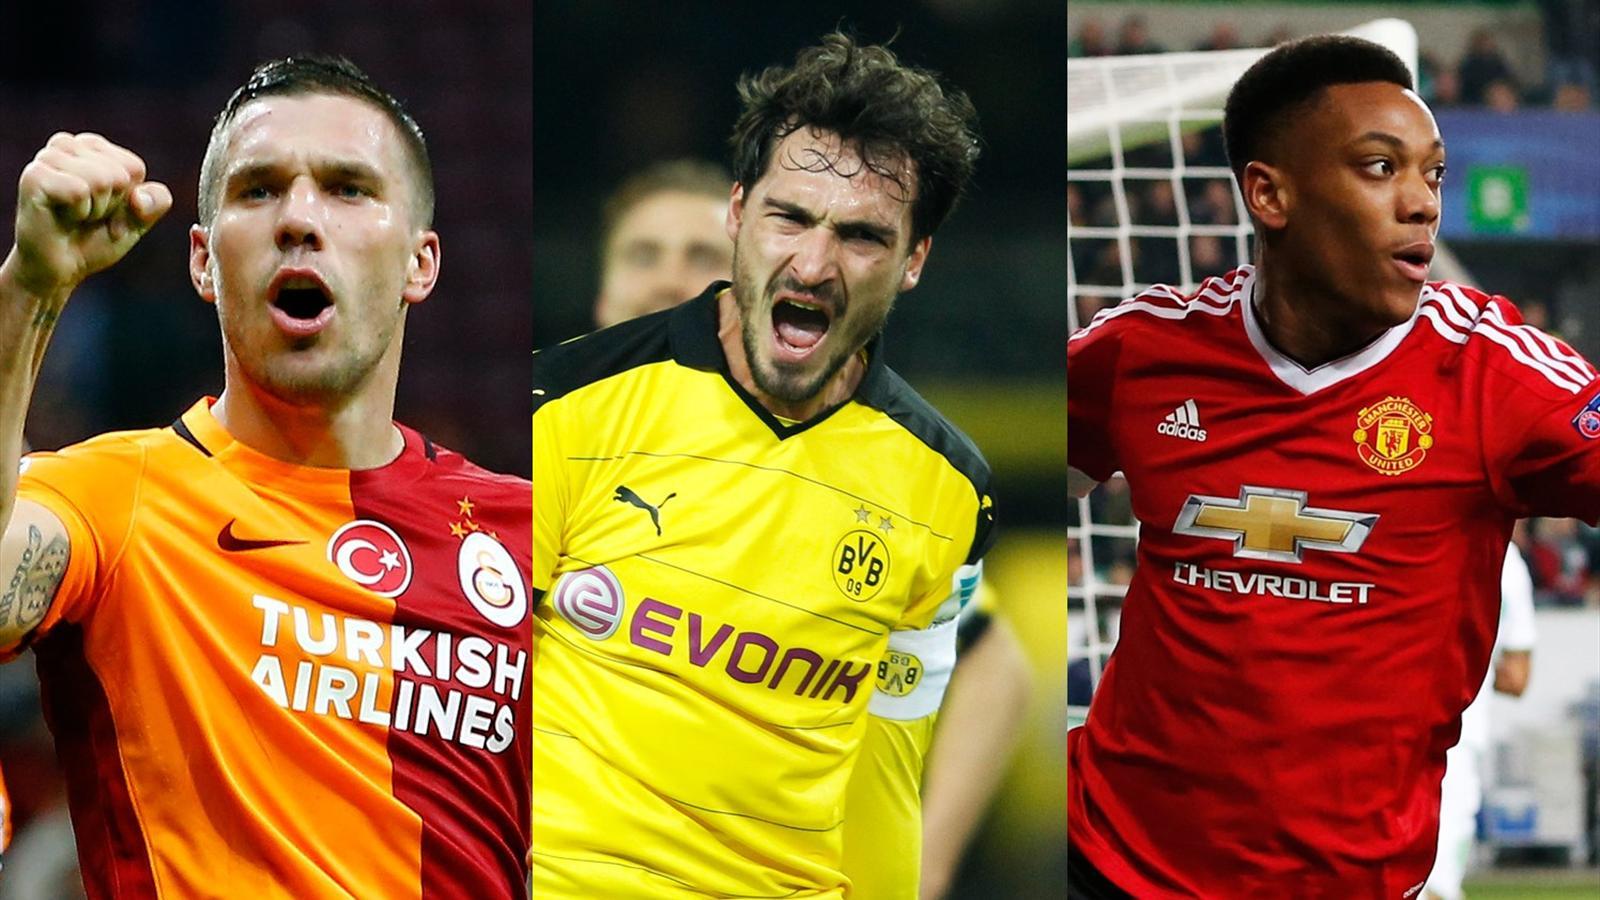 Galatasaray's Lukas Podolski, Borussia Dortmund's Mats Hummels and Manchester United's Anthony Martial